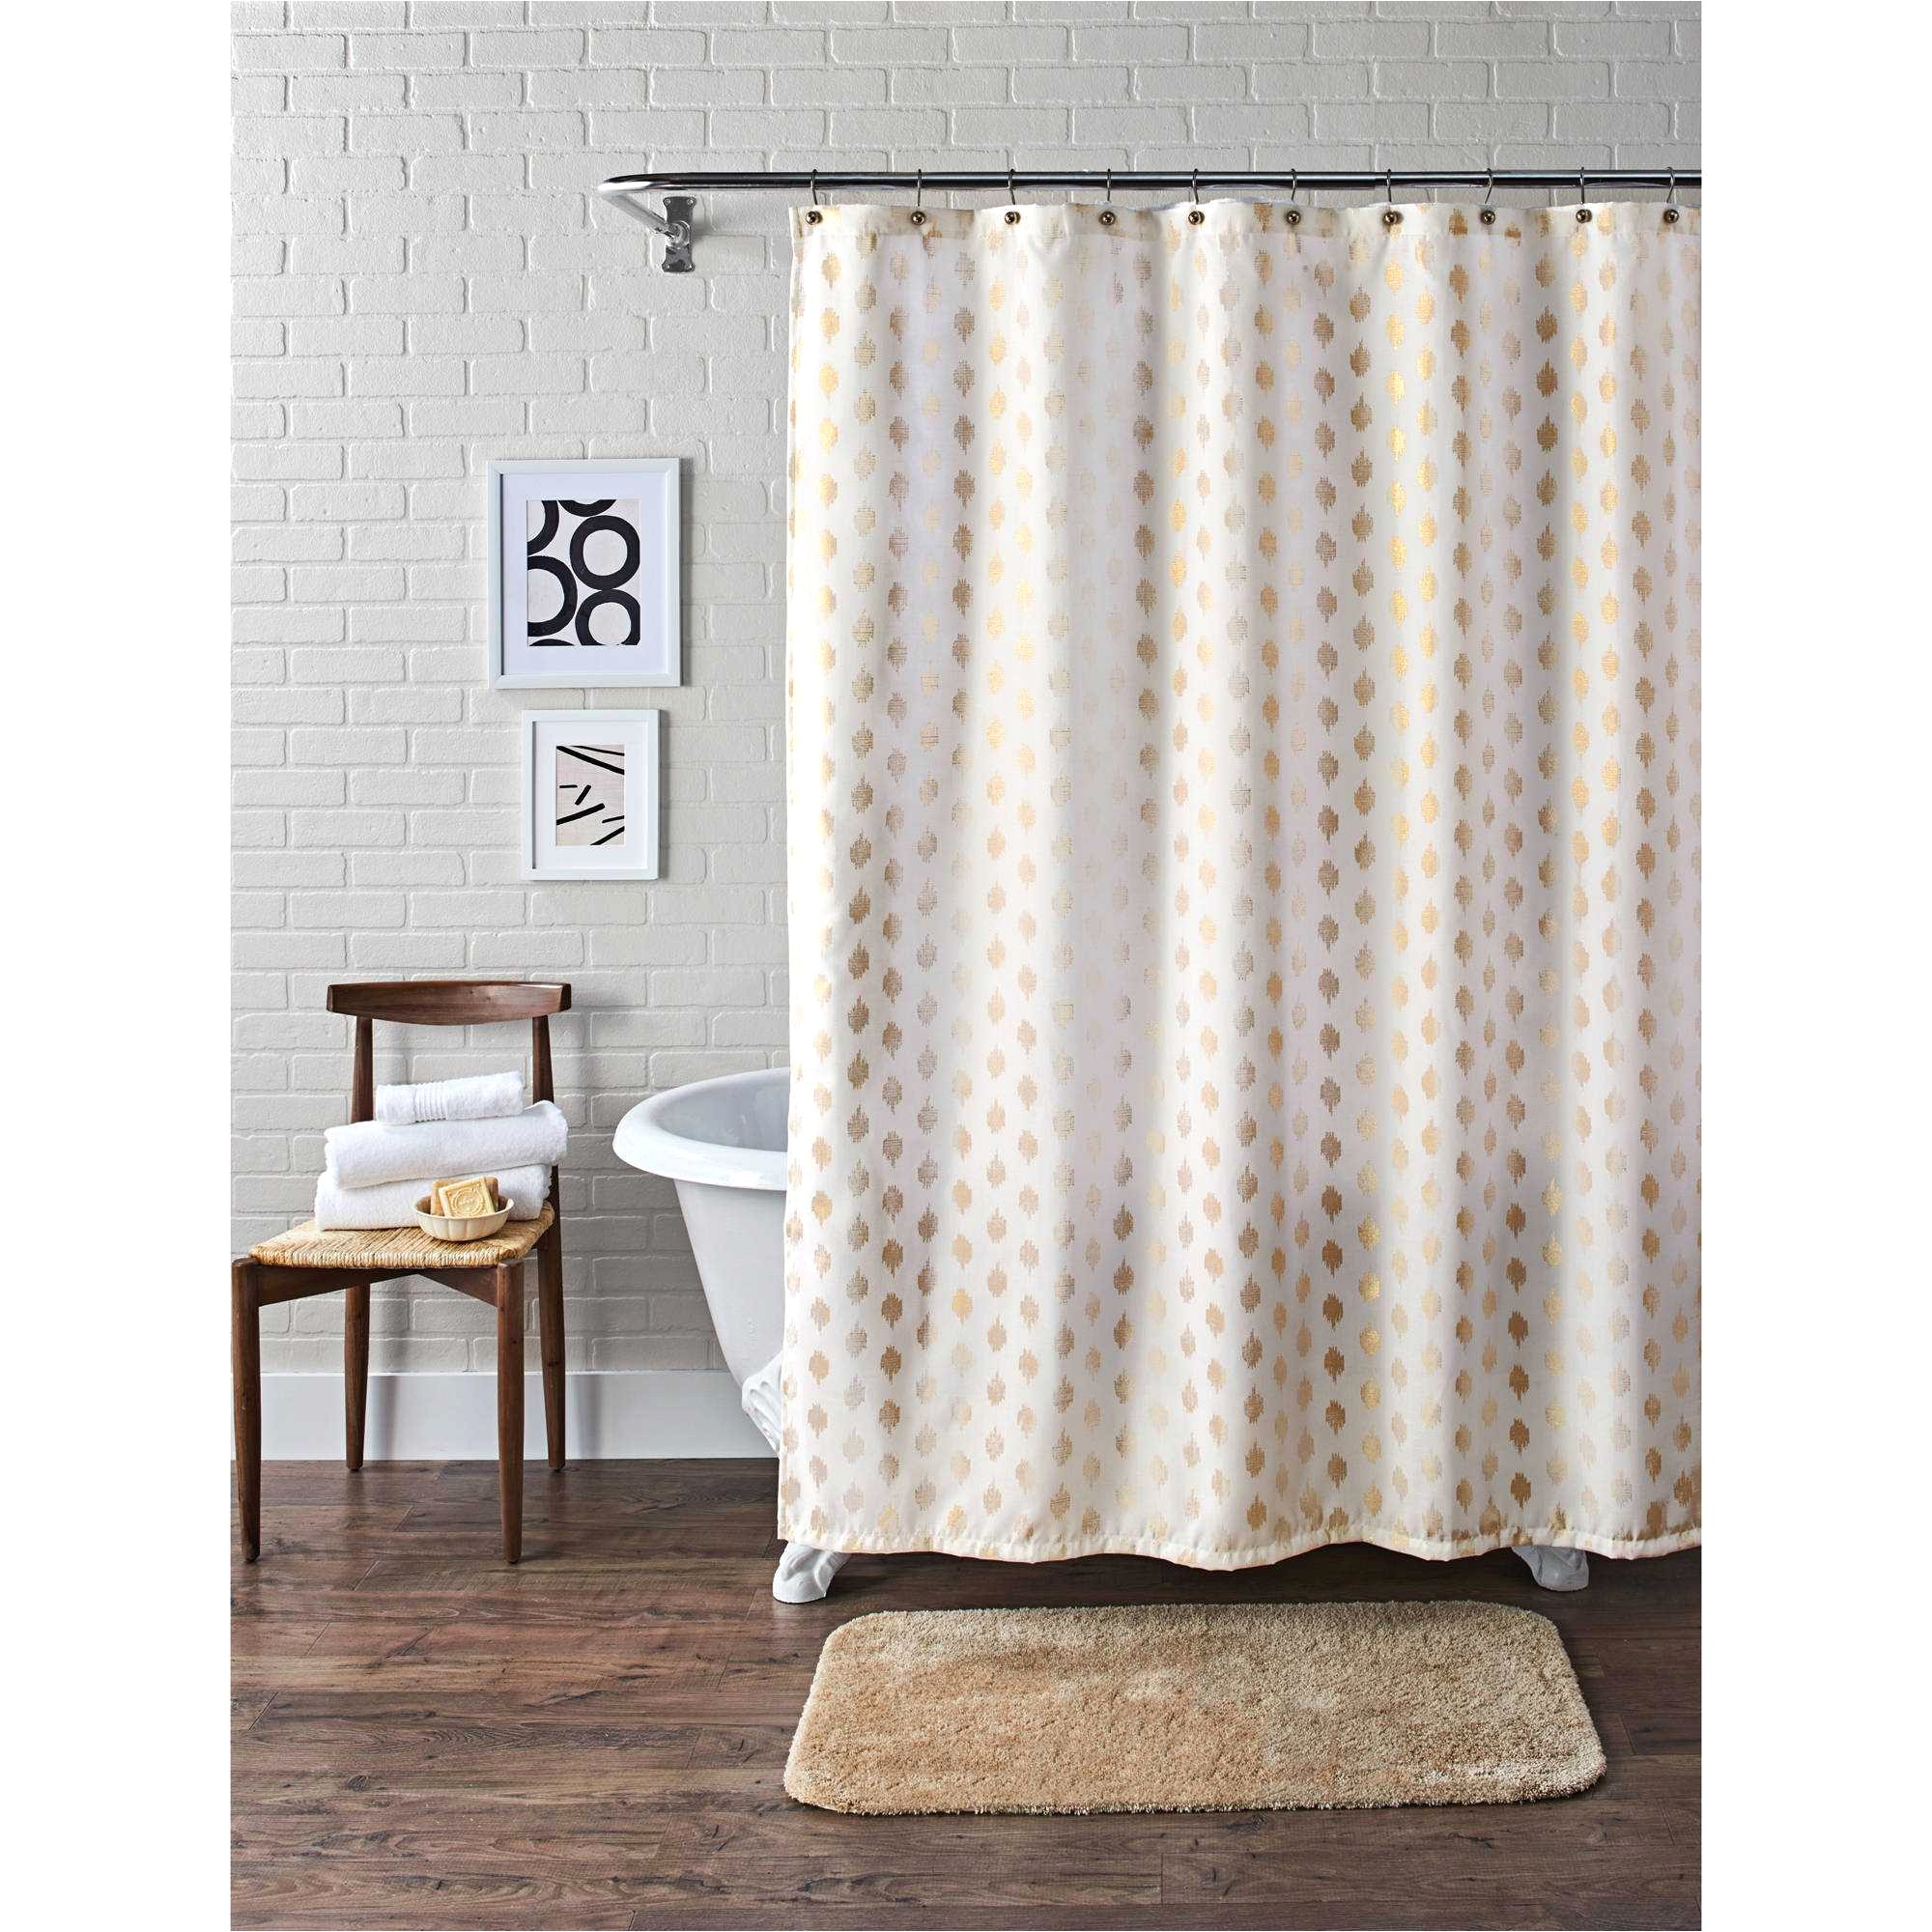 New Christmas Shower Curtains Walmart